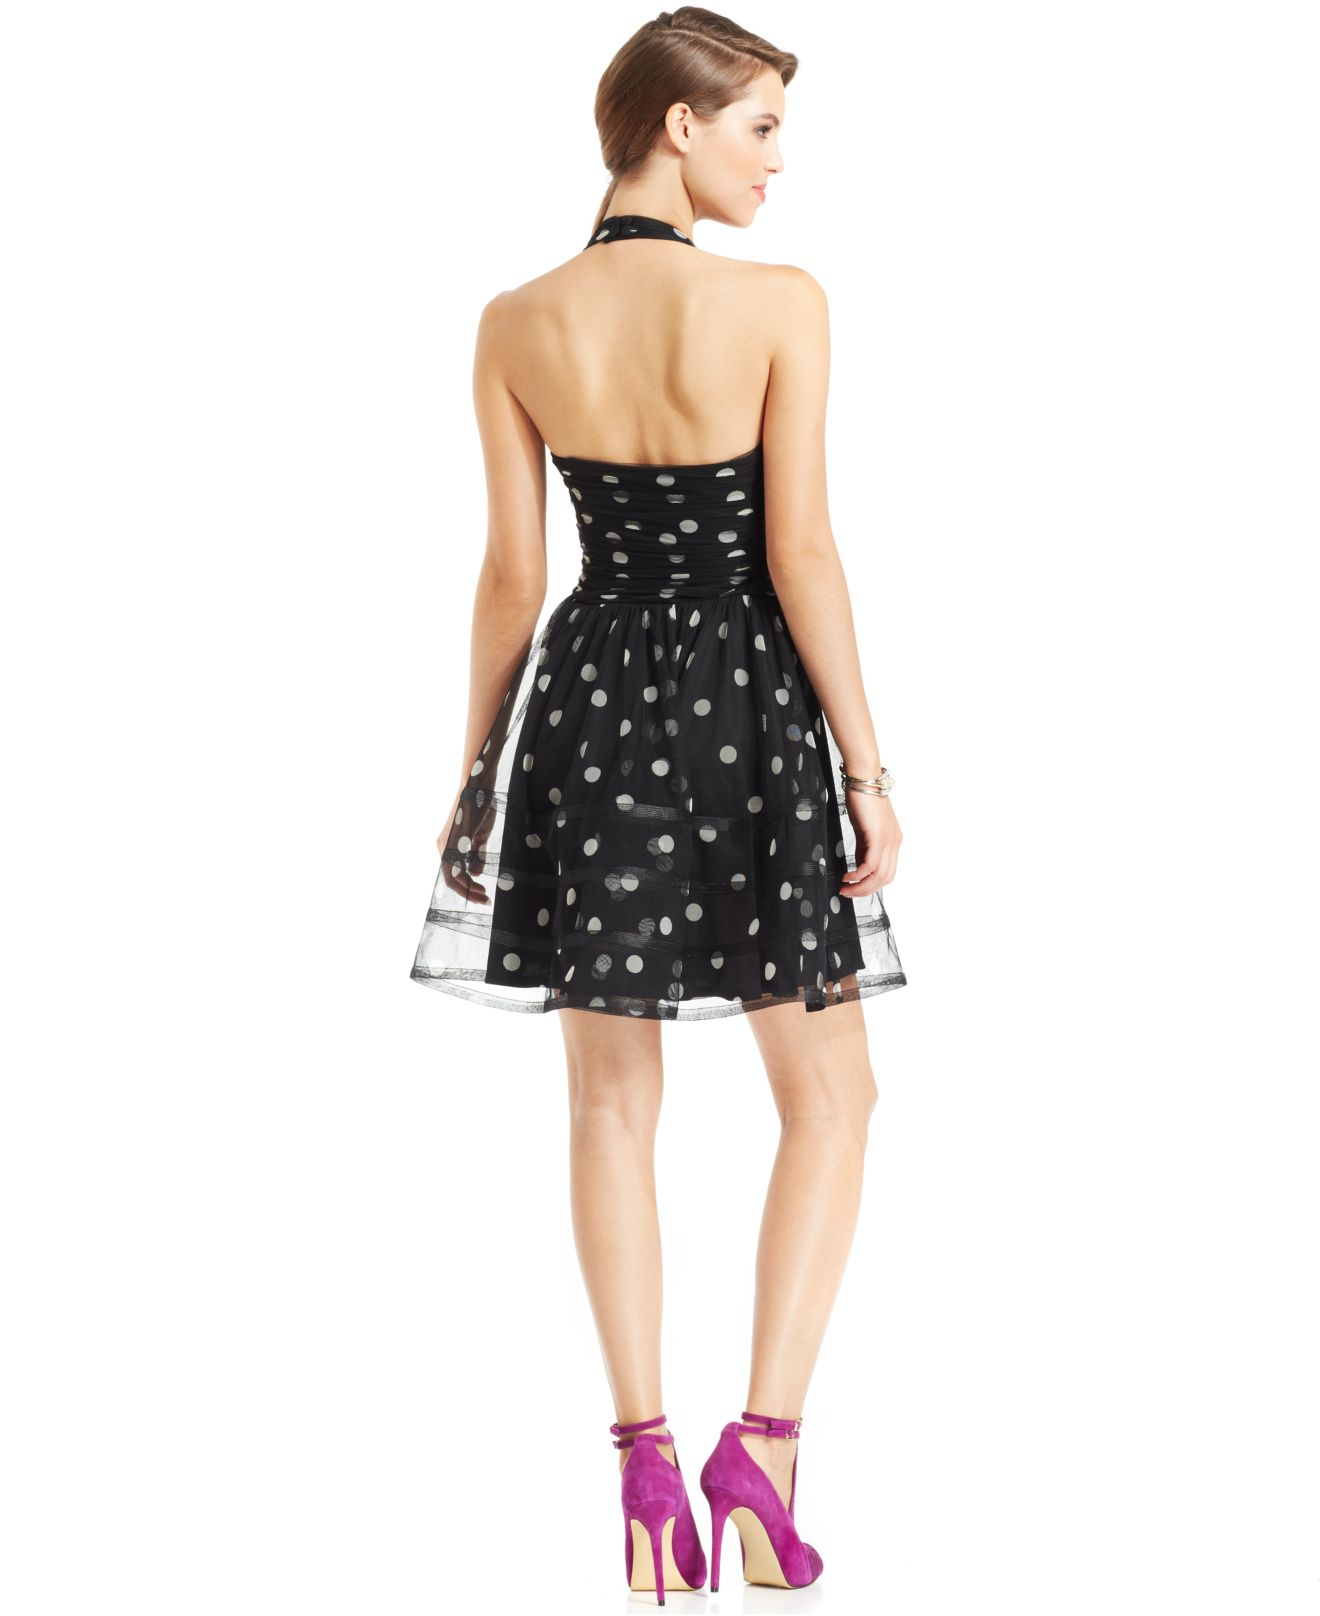 Betsey johnson dress sleeveless ombre lace halter